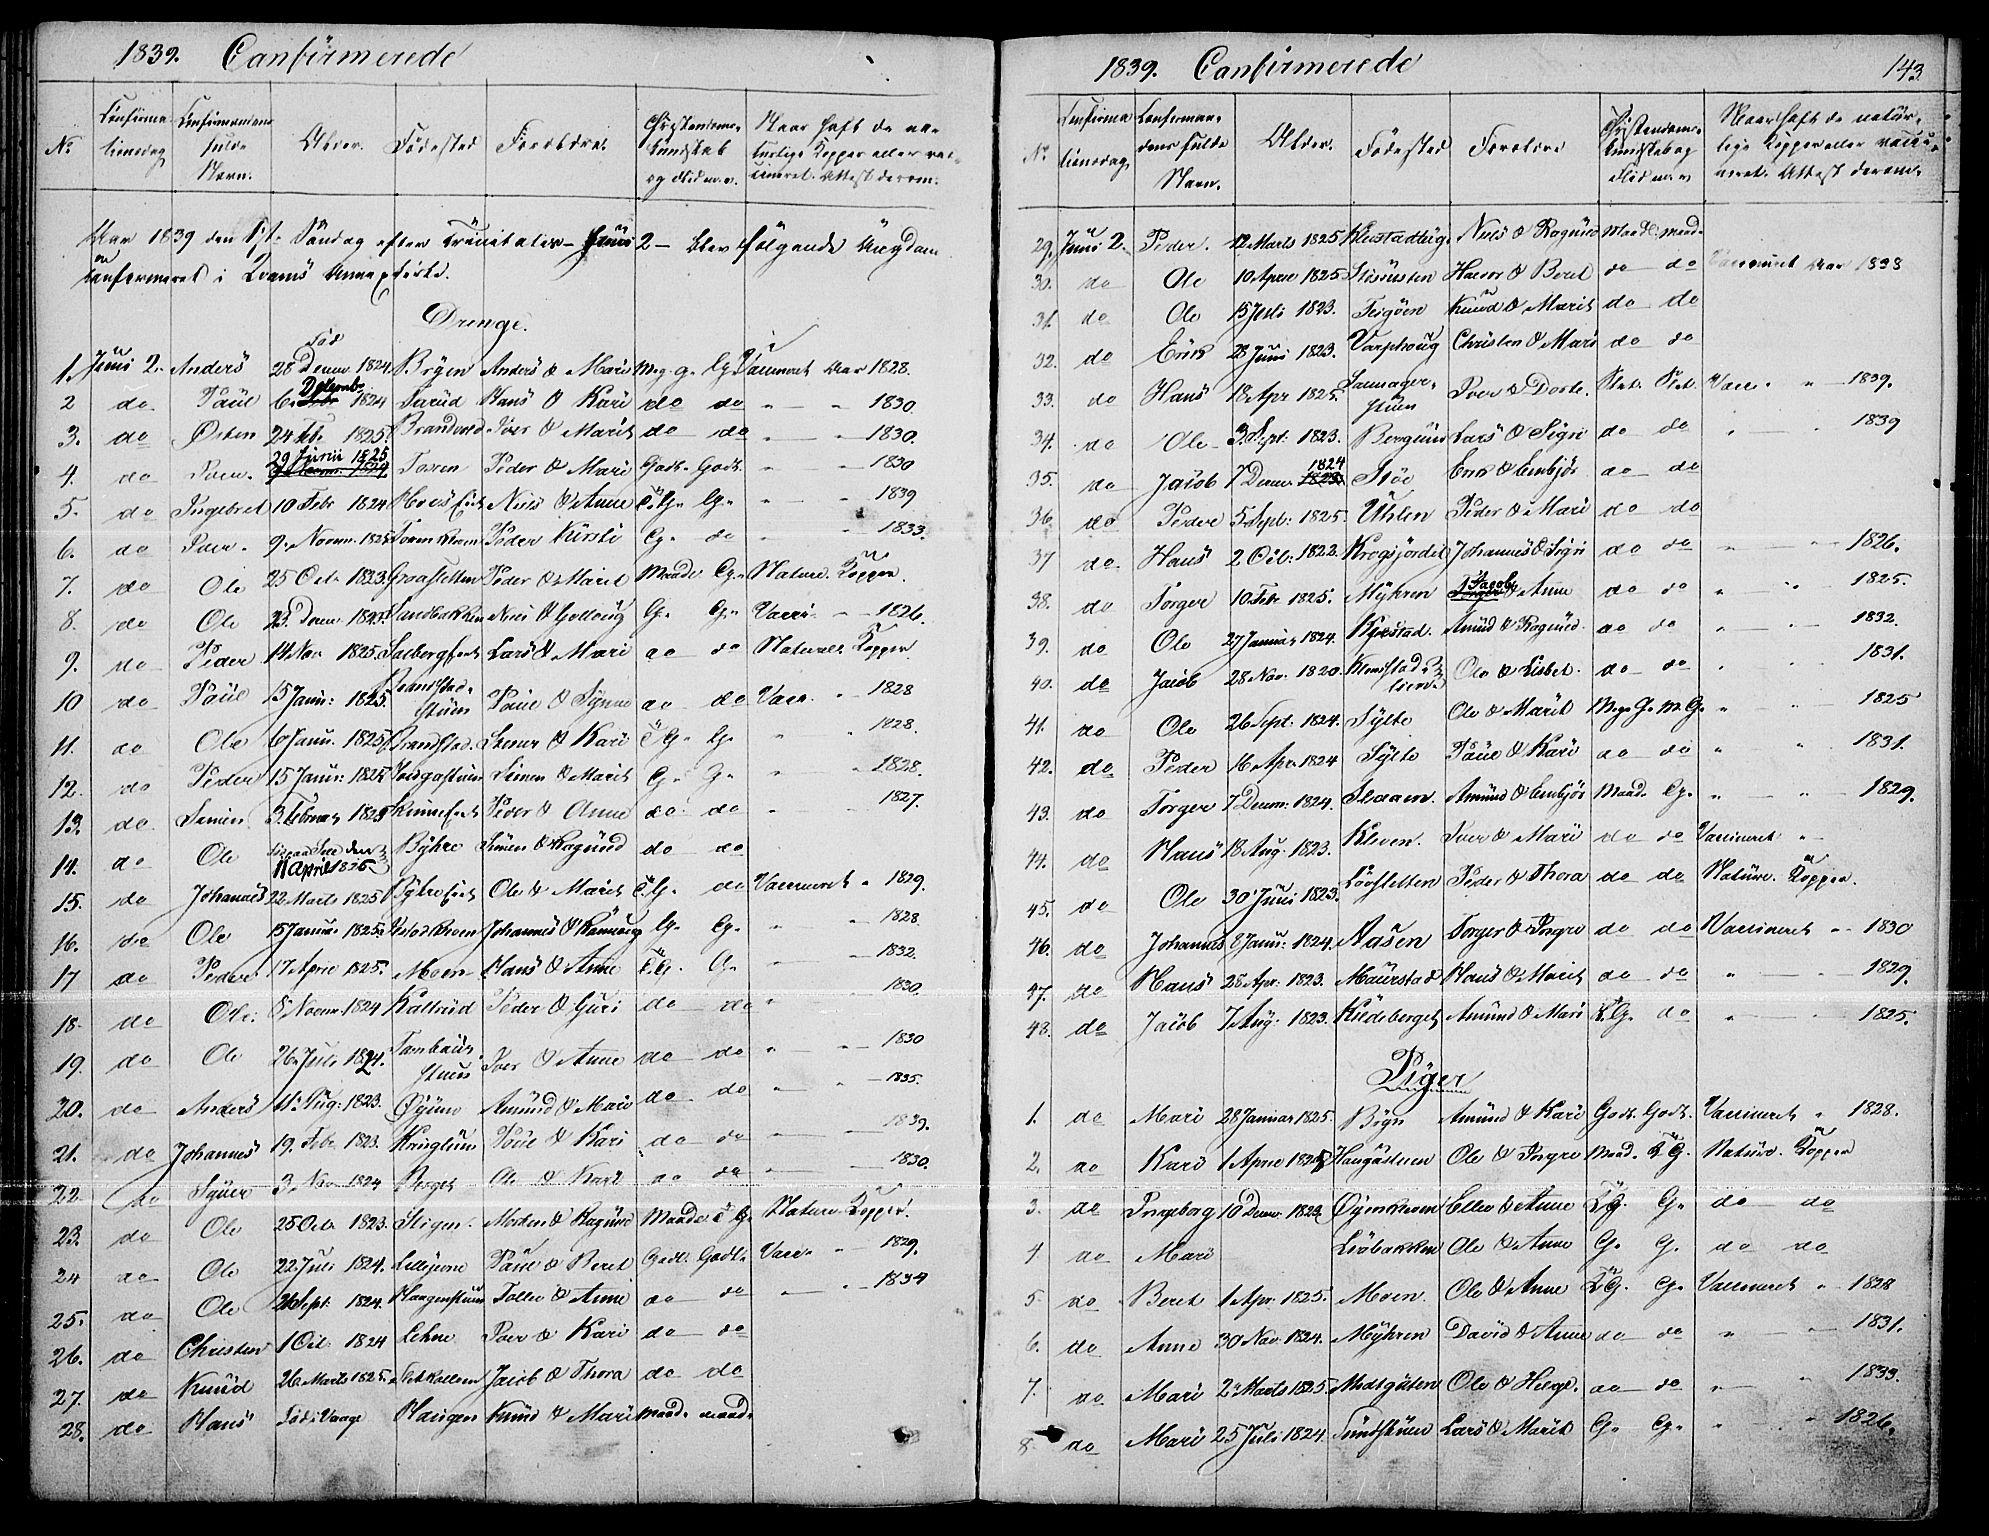 SAH, Fron prestekontor, H/Ha/Haa/L0004: Ministerialbok nr. 4, 1839-1848, s. 143